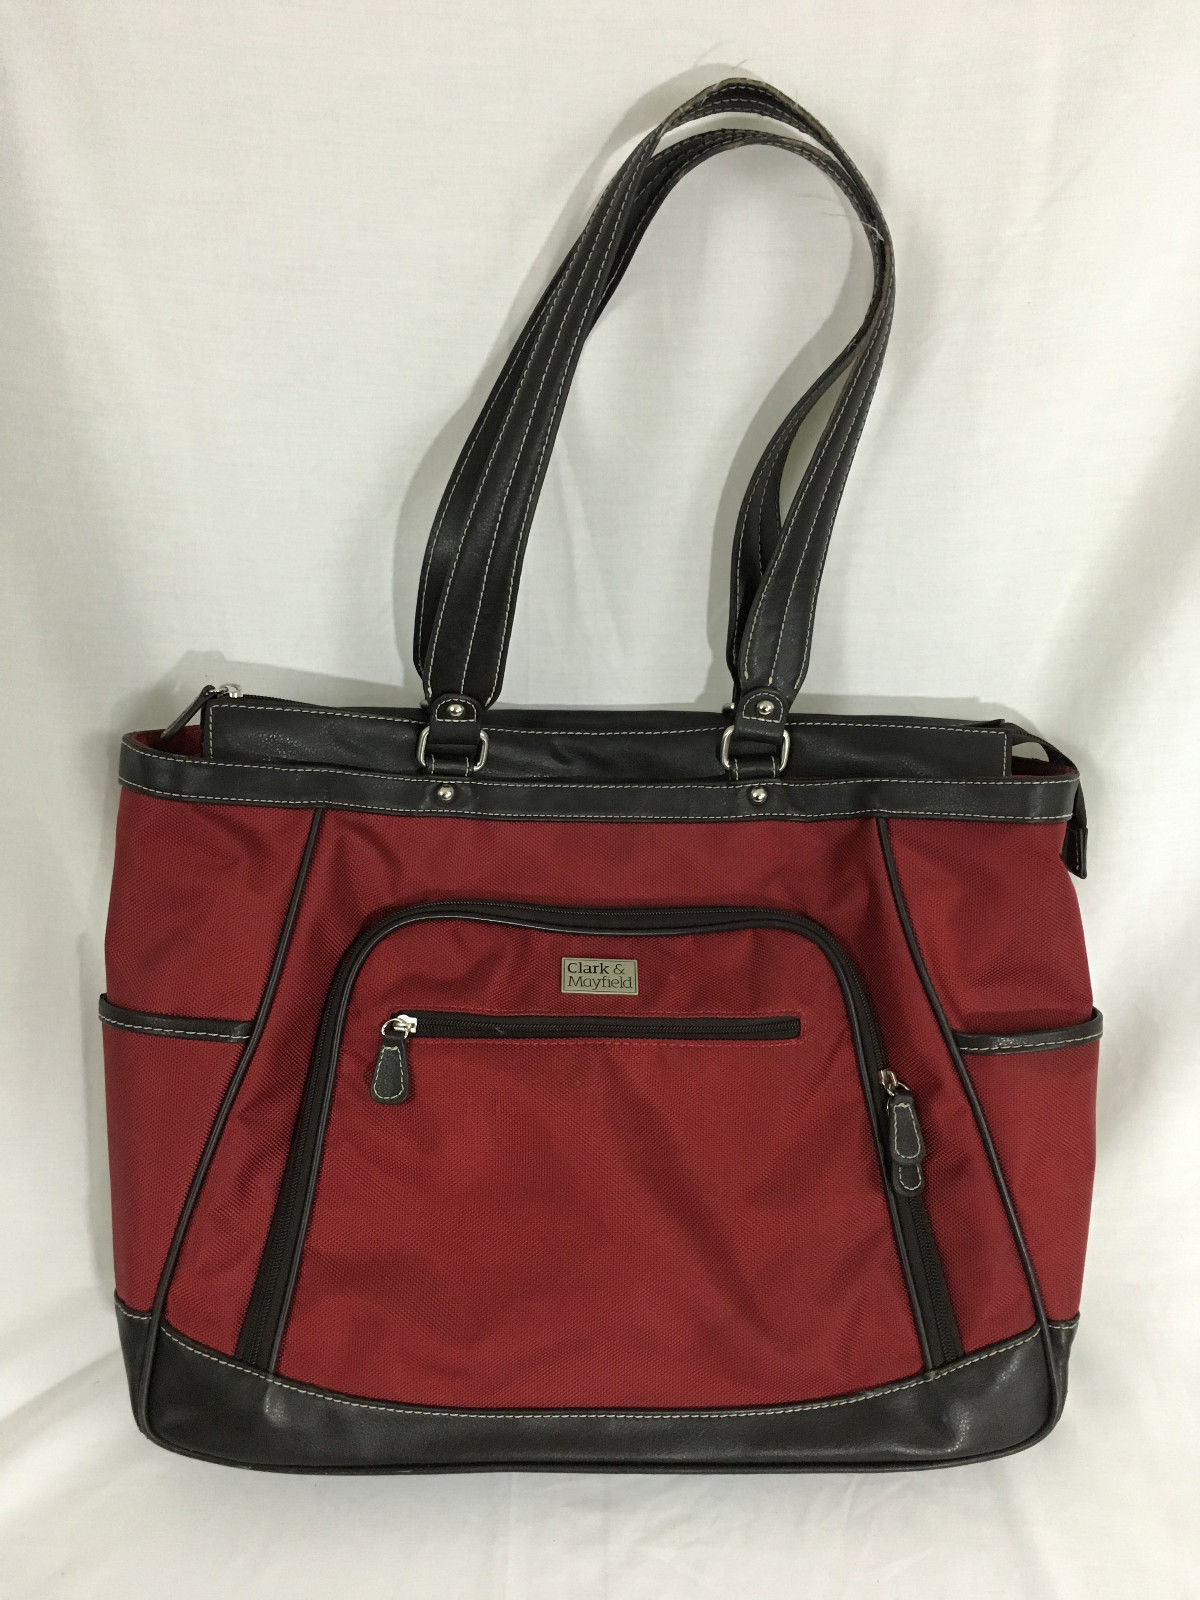 Clark & Mayfield Red 18 Inch Laptop Handbag Briefcase Tote - $49.99